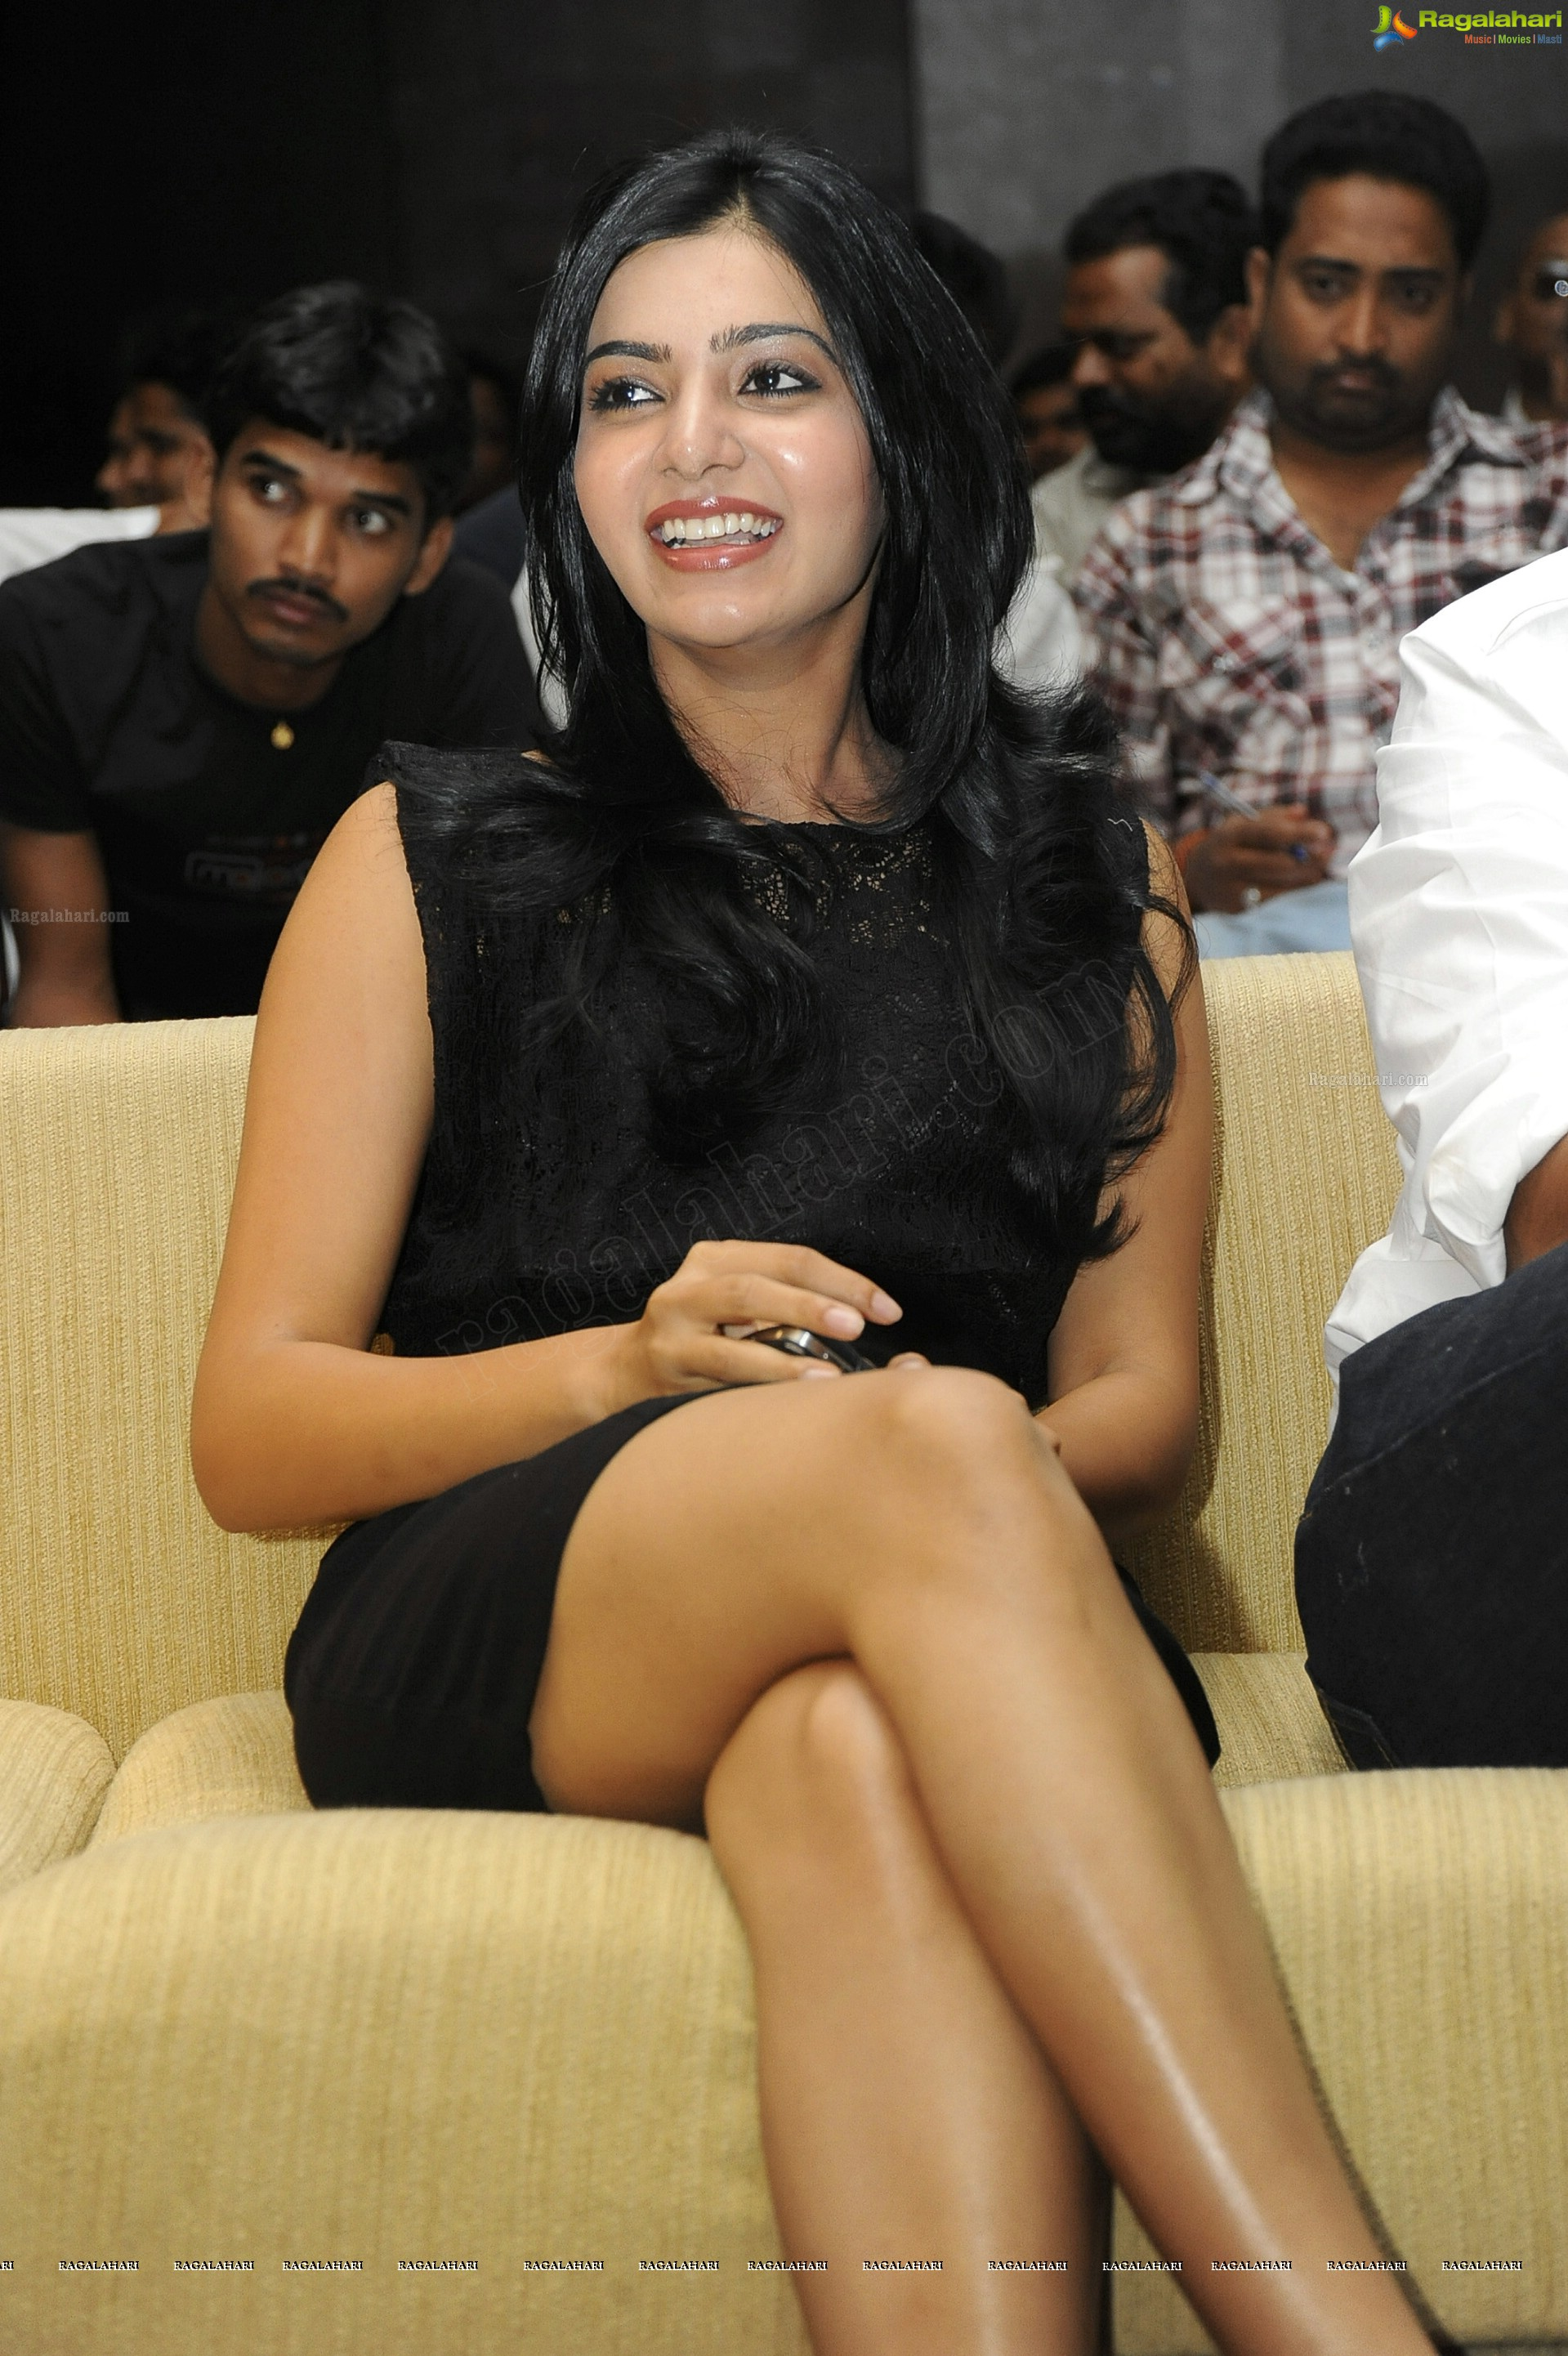 samantha (hd) image 13 | telugu actress images,images, photos